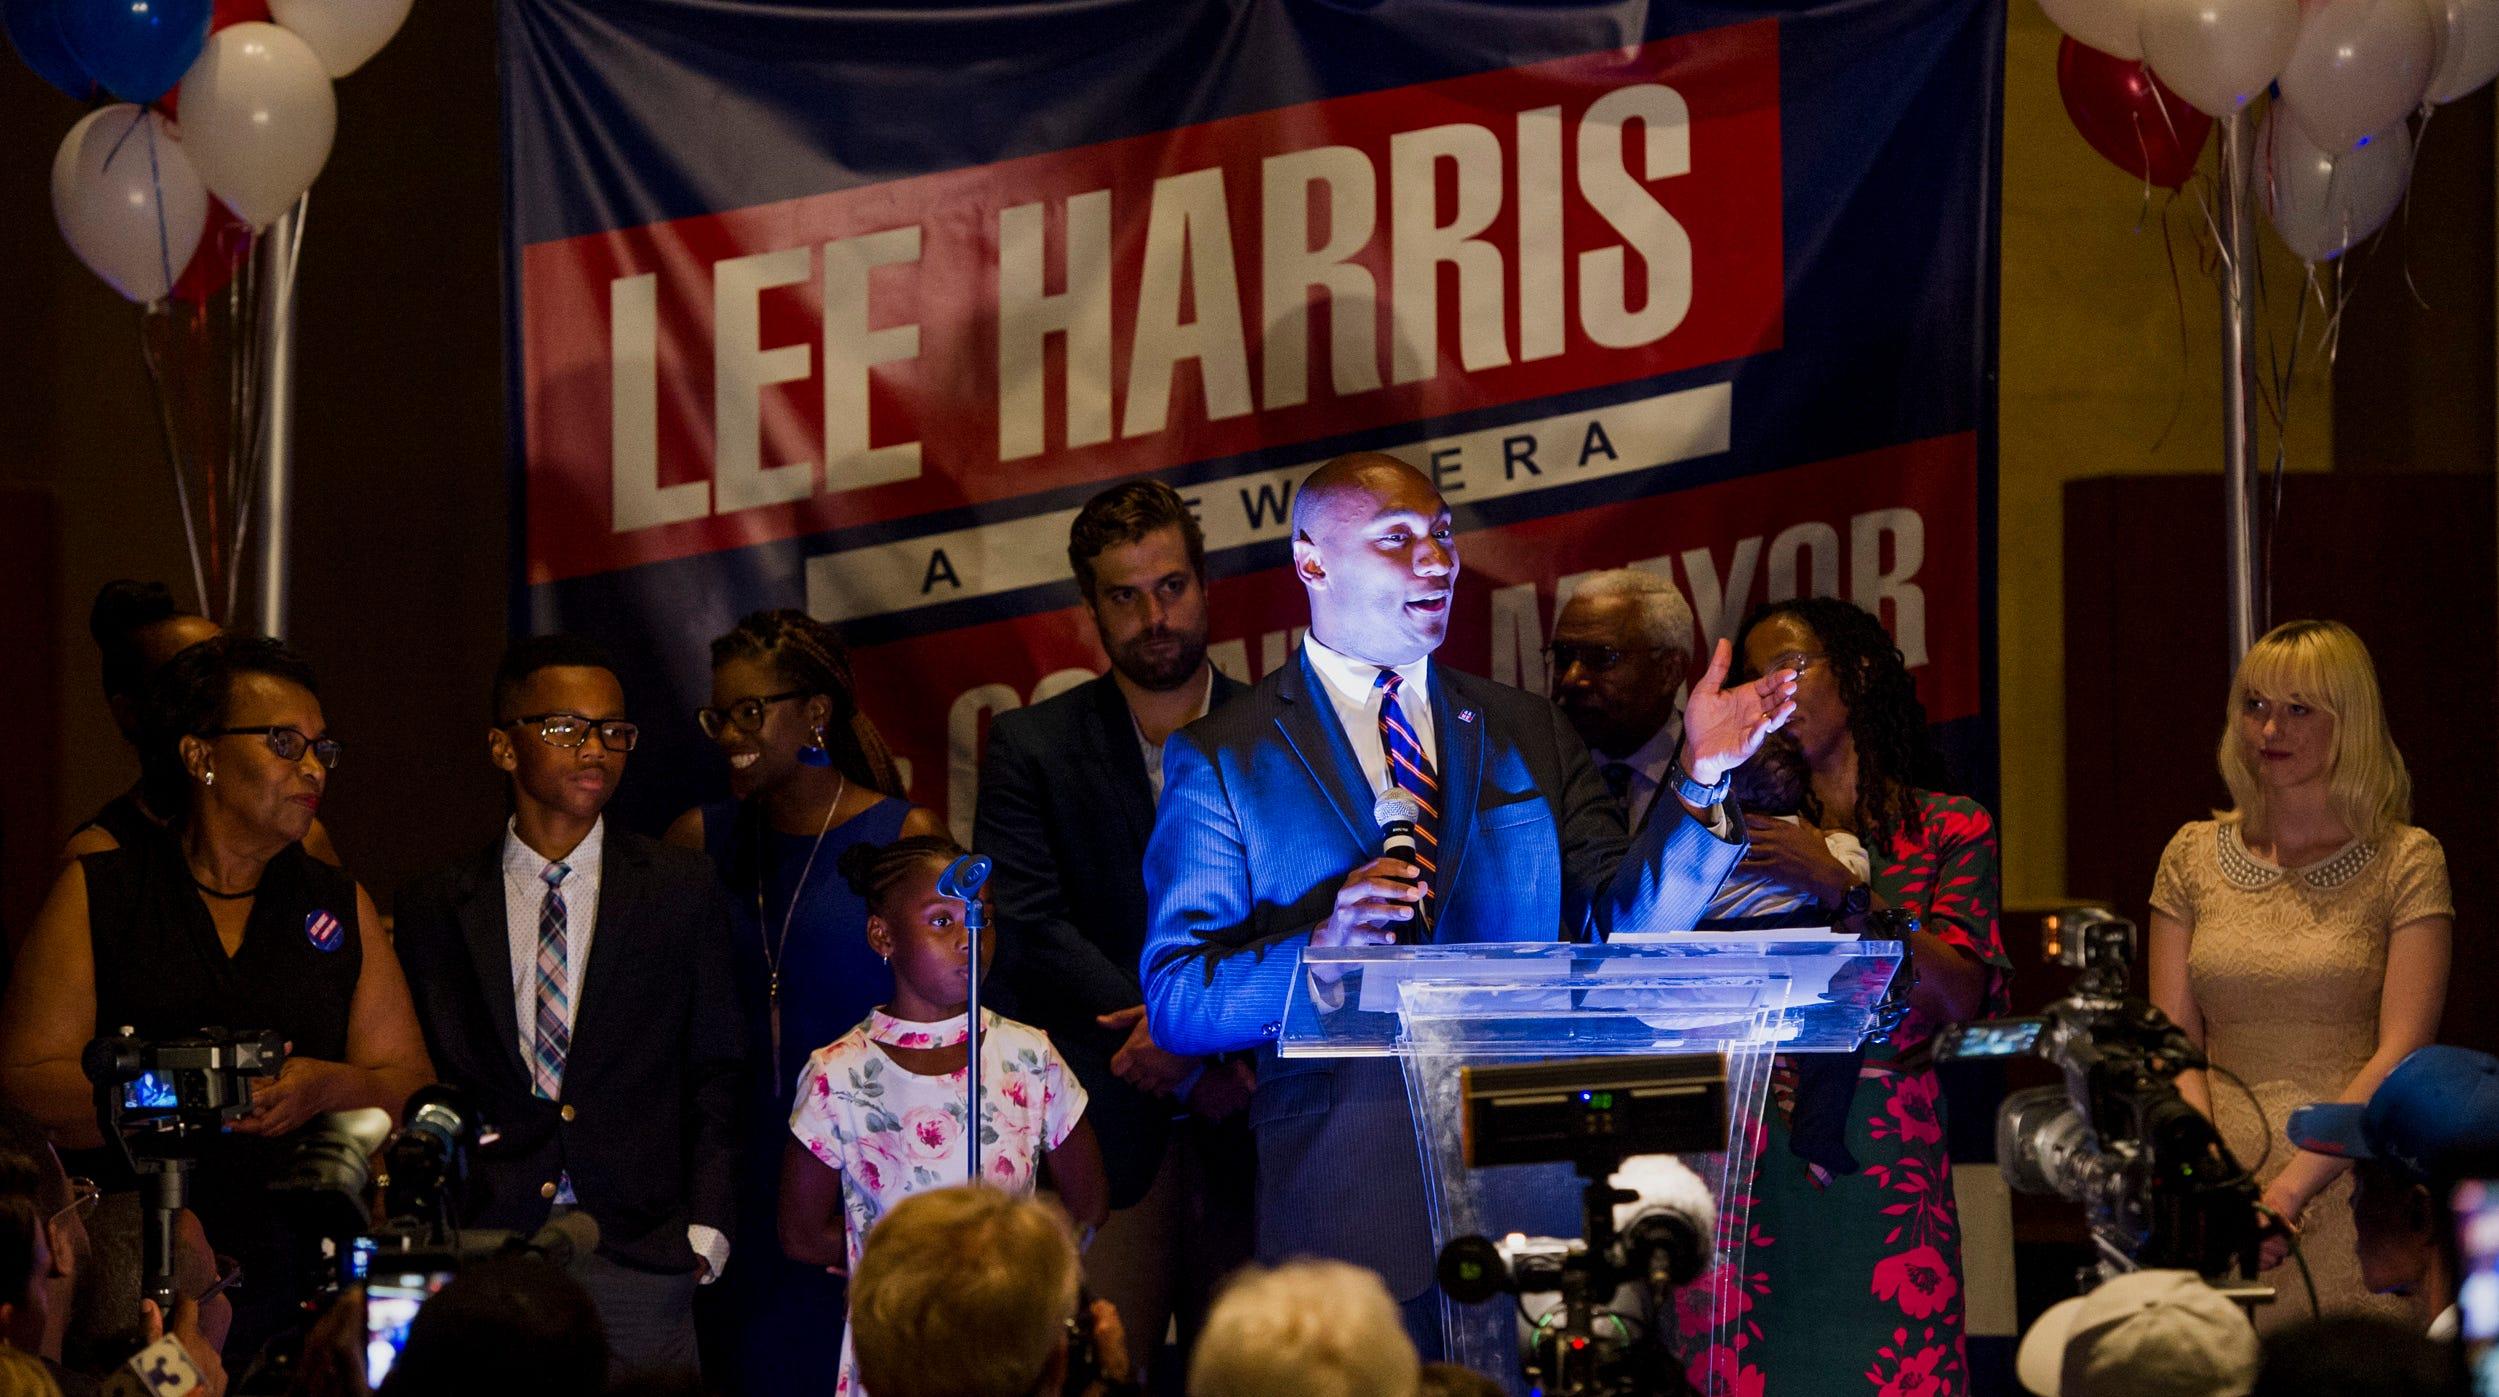 Evanoff: Looking at Lee Harris' populist vision from a pragmatist's viewpoint